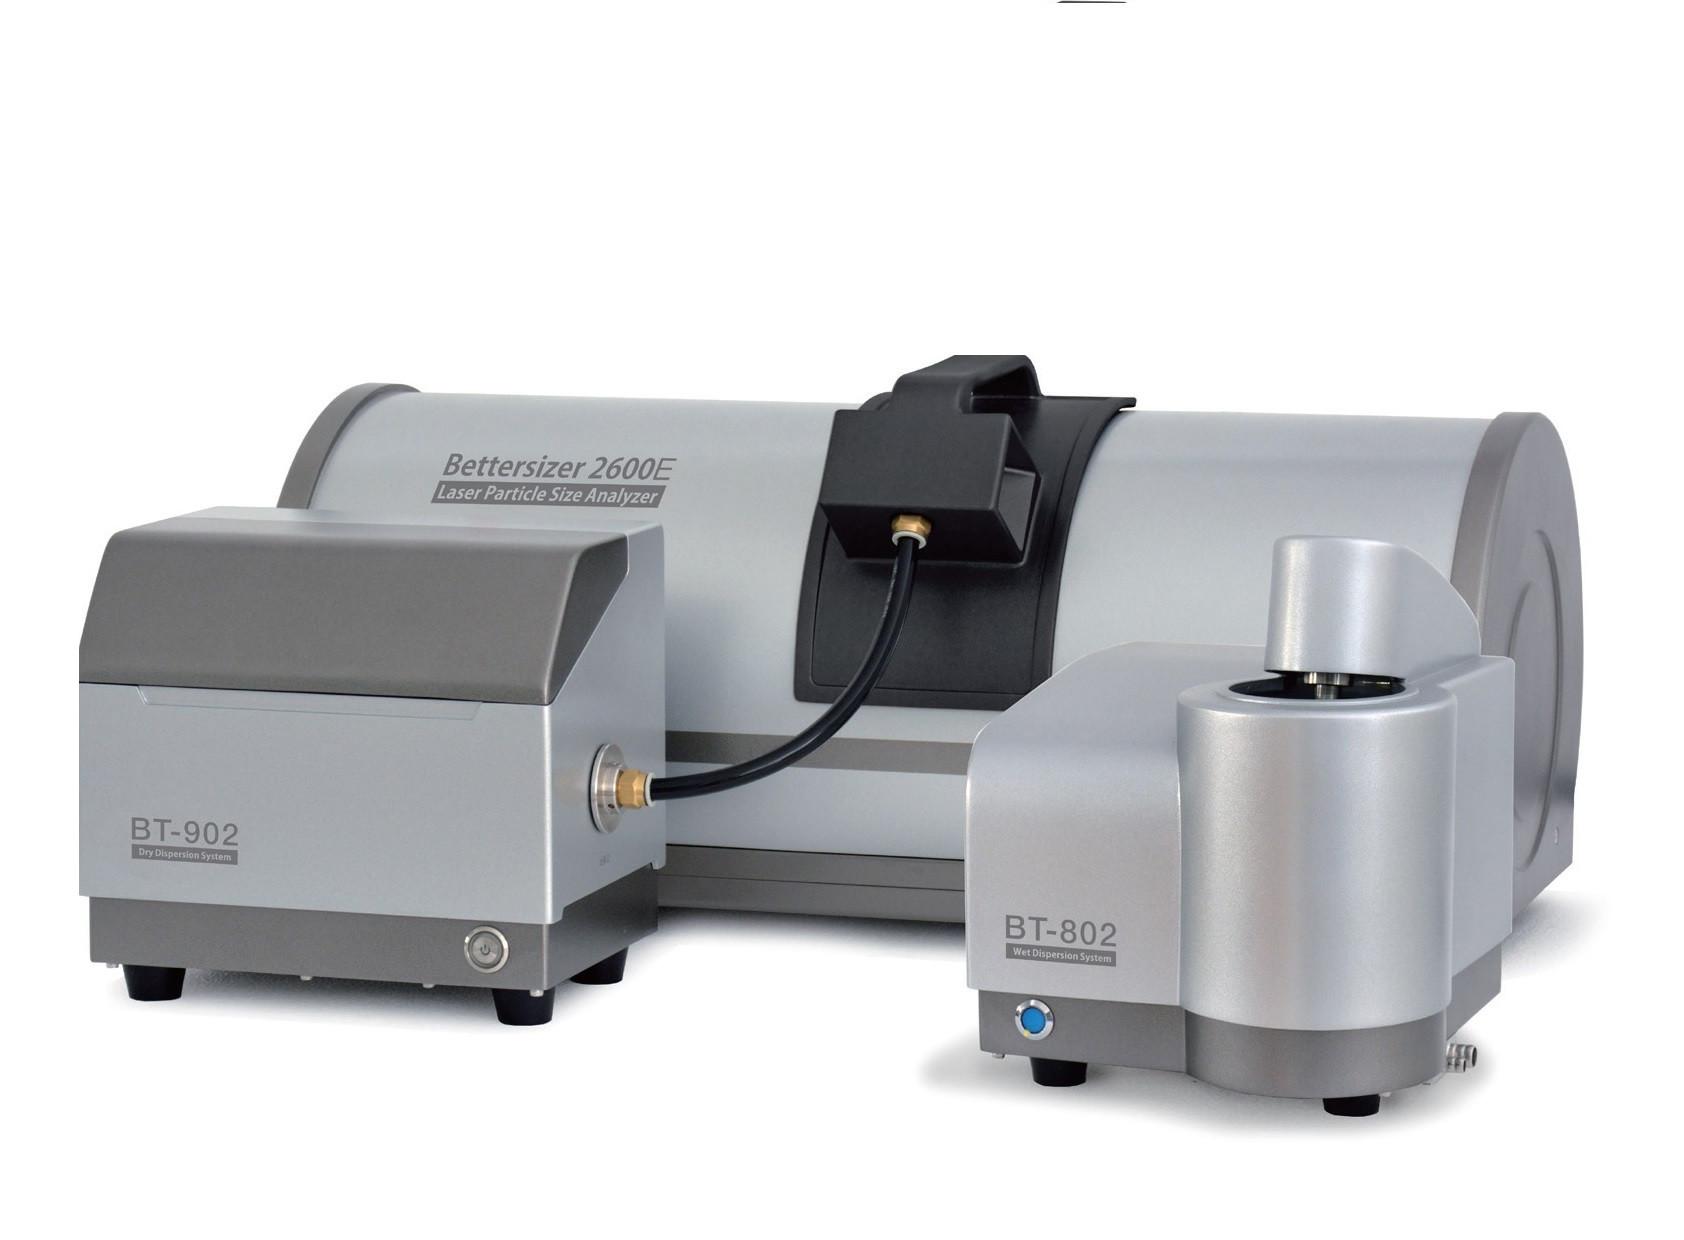 Bettersizer 2600E 乾濕兩用 雷射粒徑分析儀